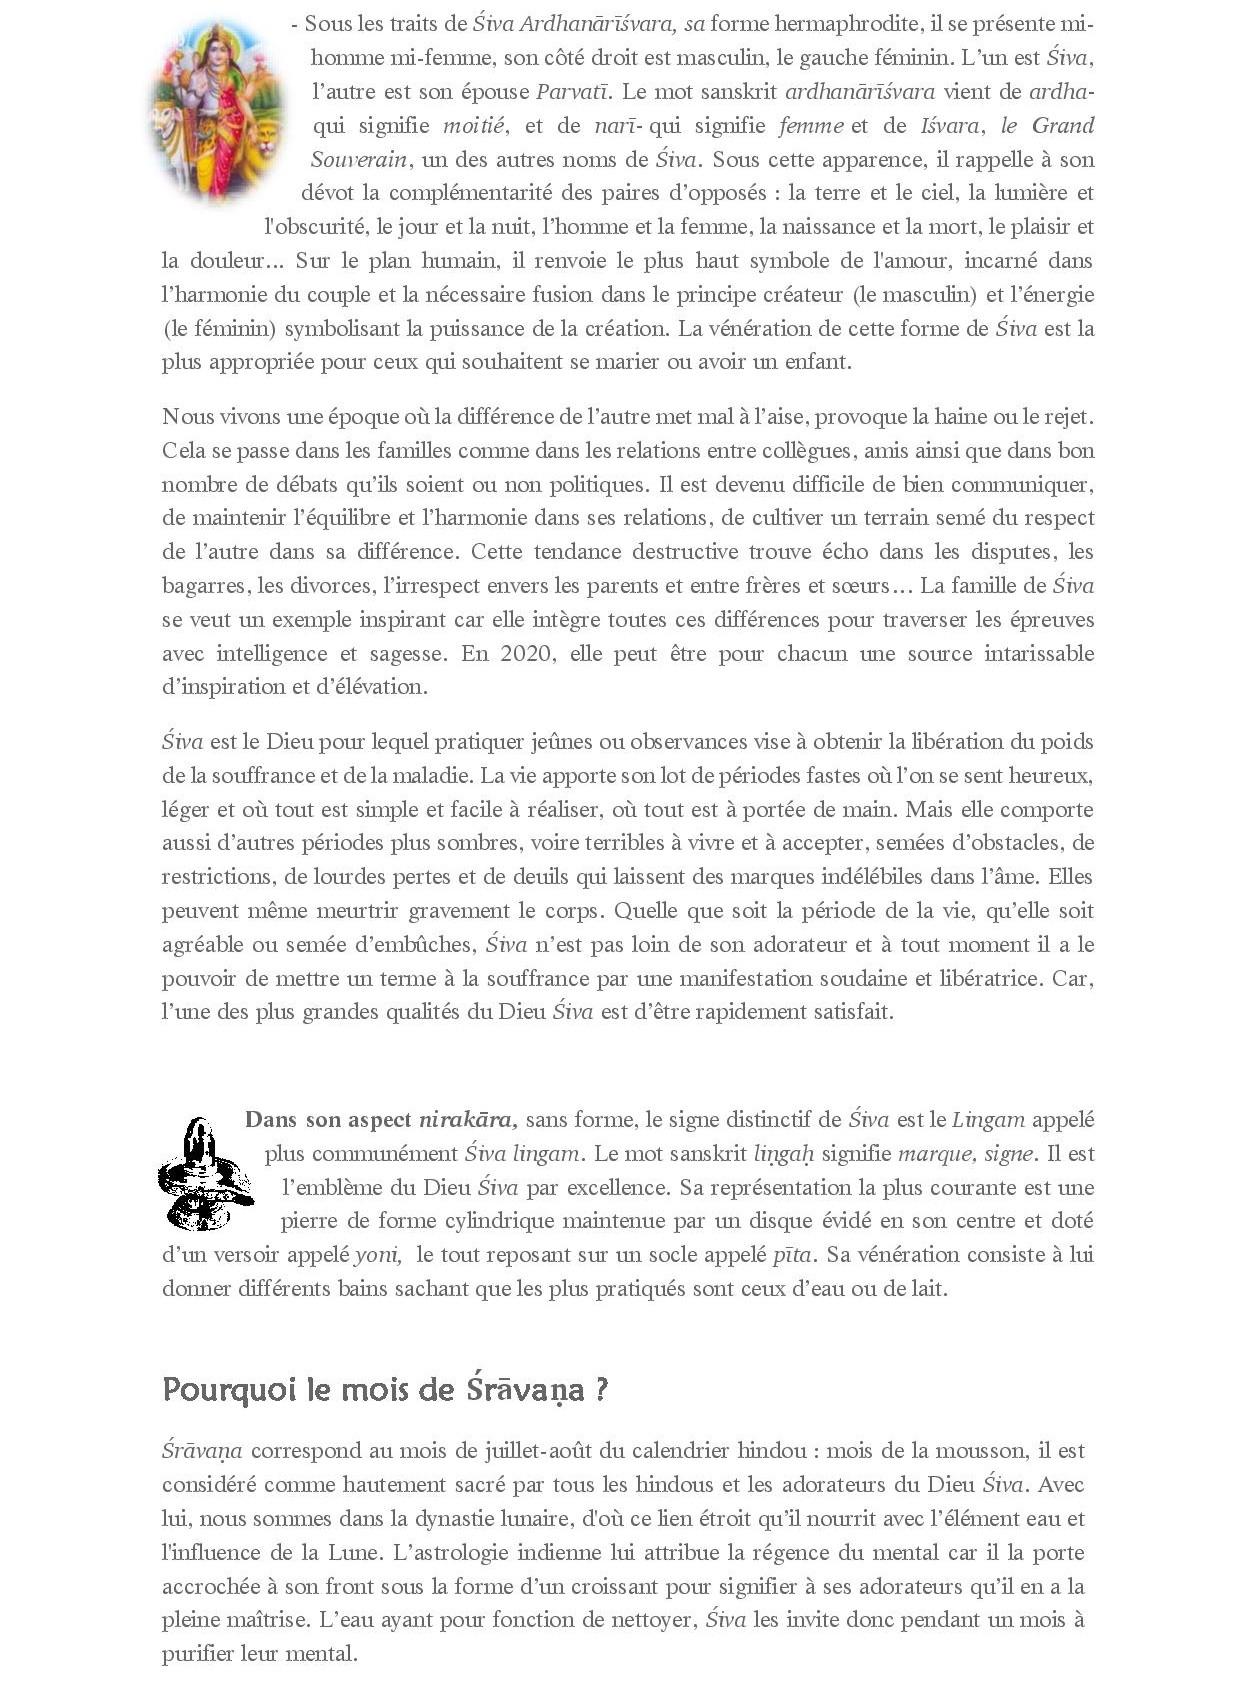 shiva sravana texte 2020-page-002